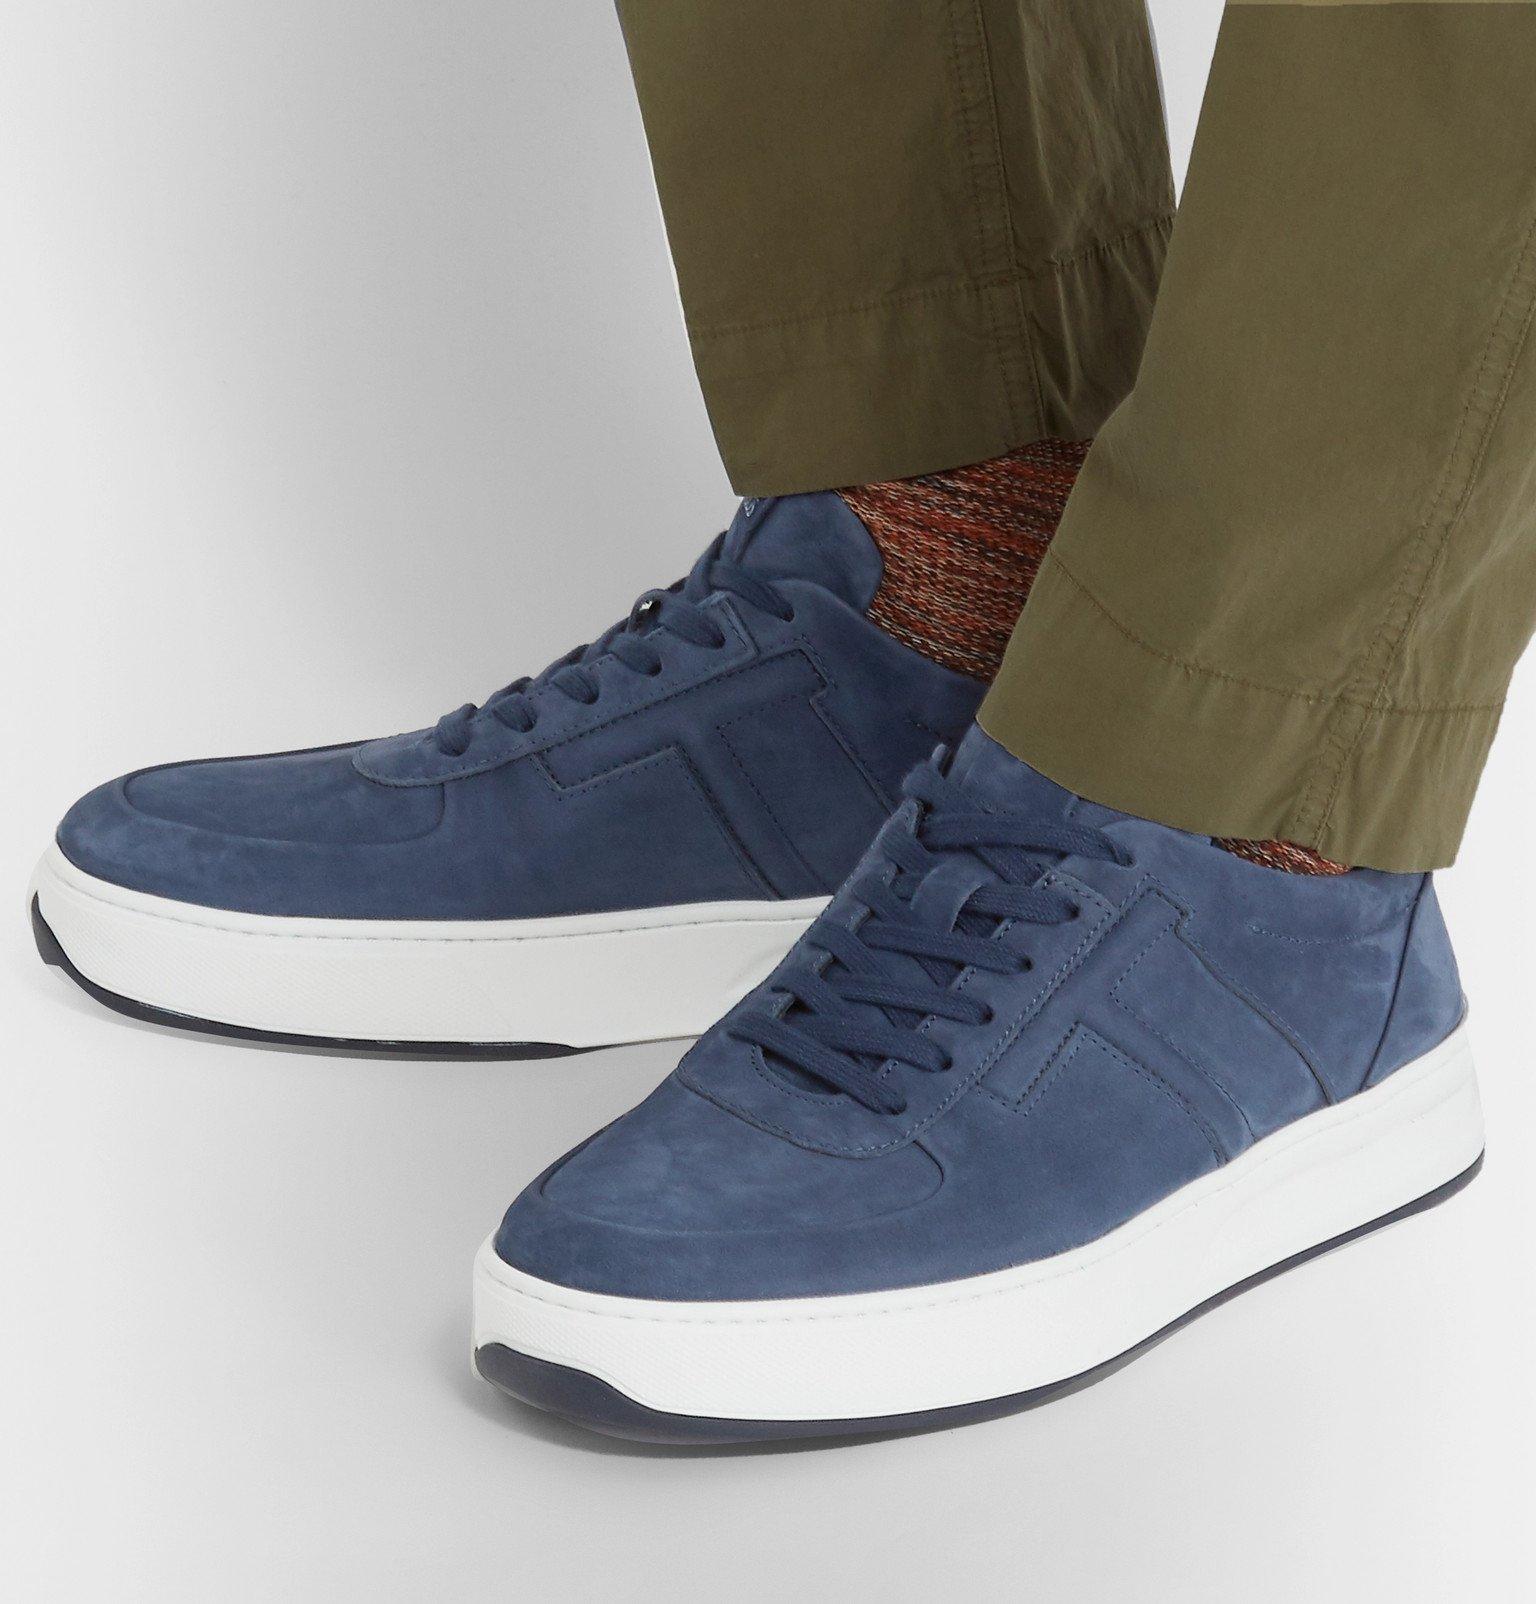 Tod's - Cassetta Nubuck Sneakers - Blue